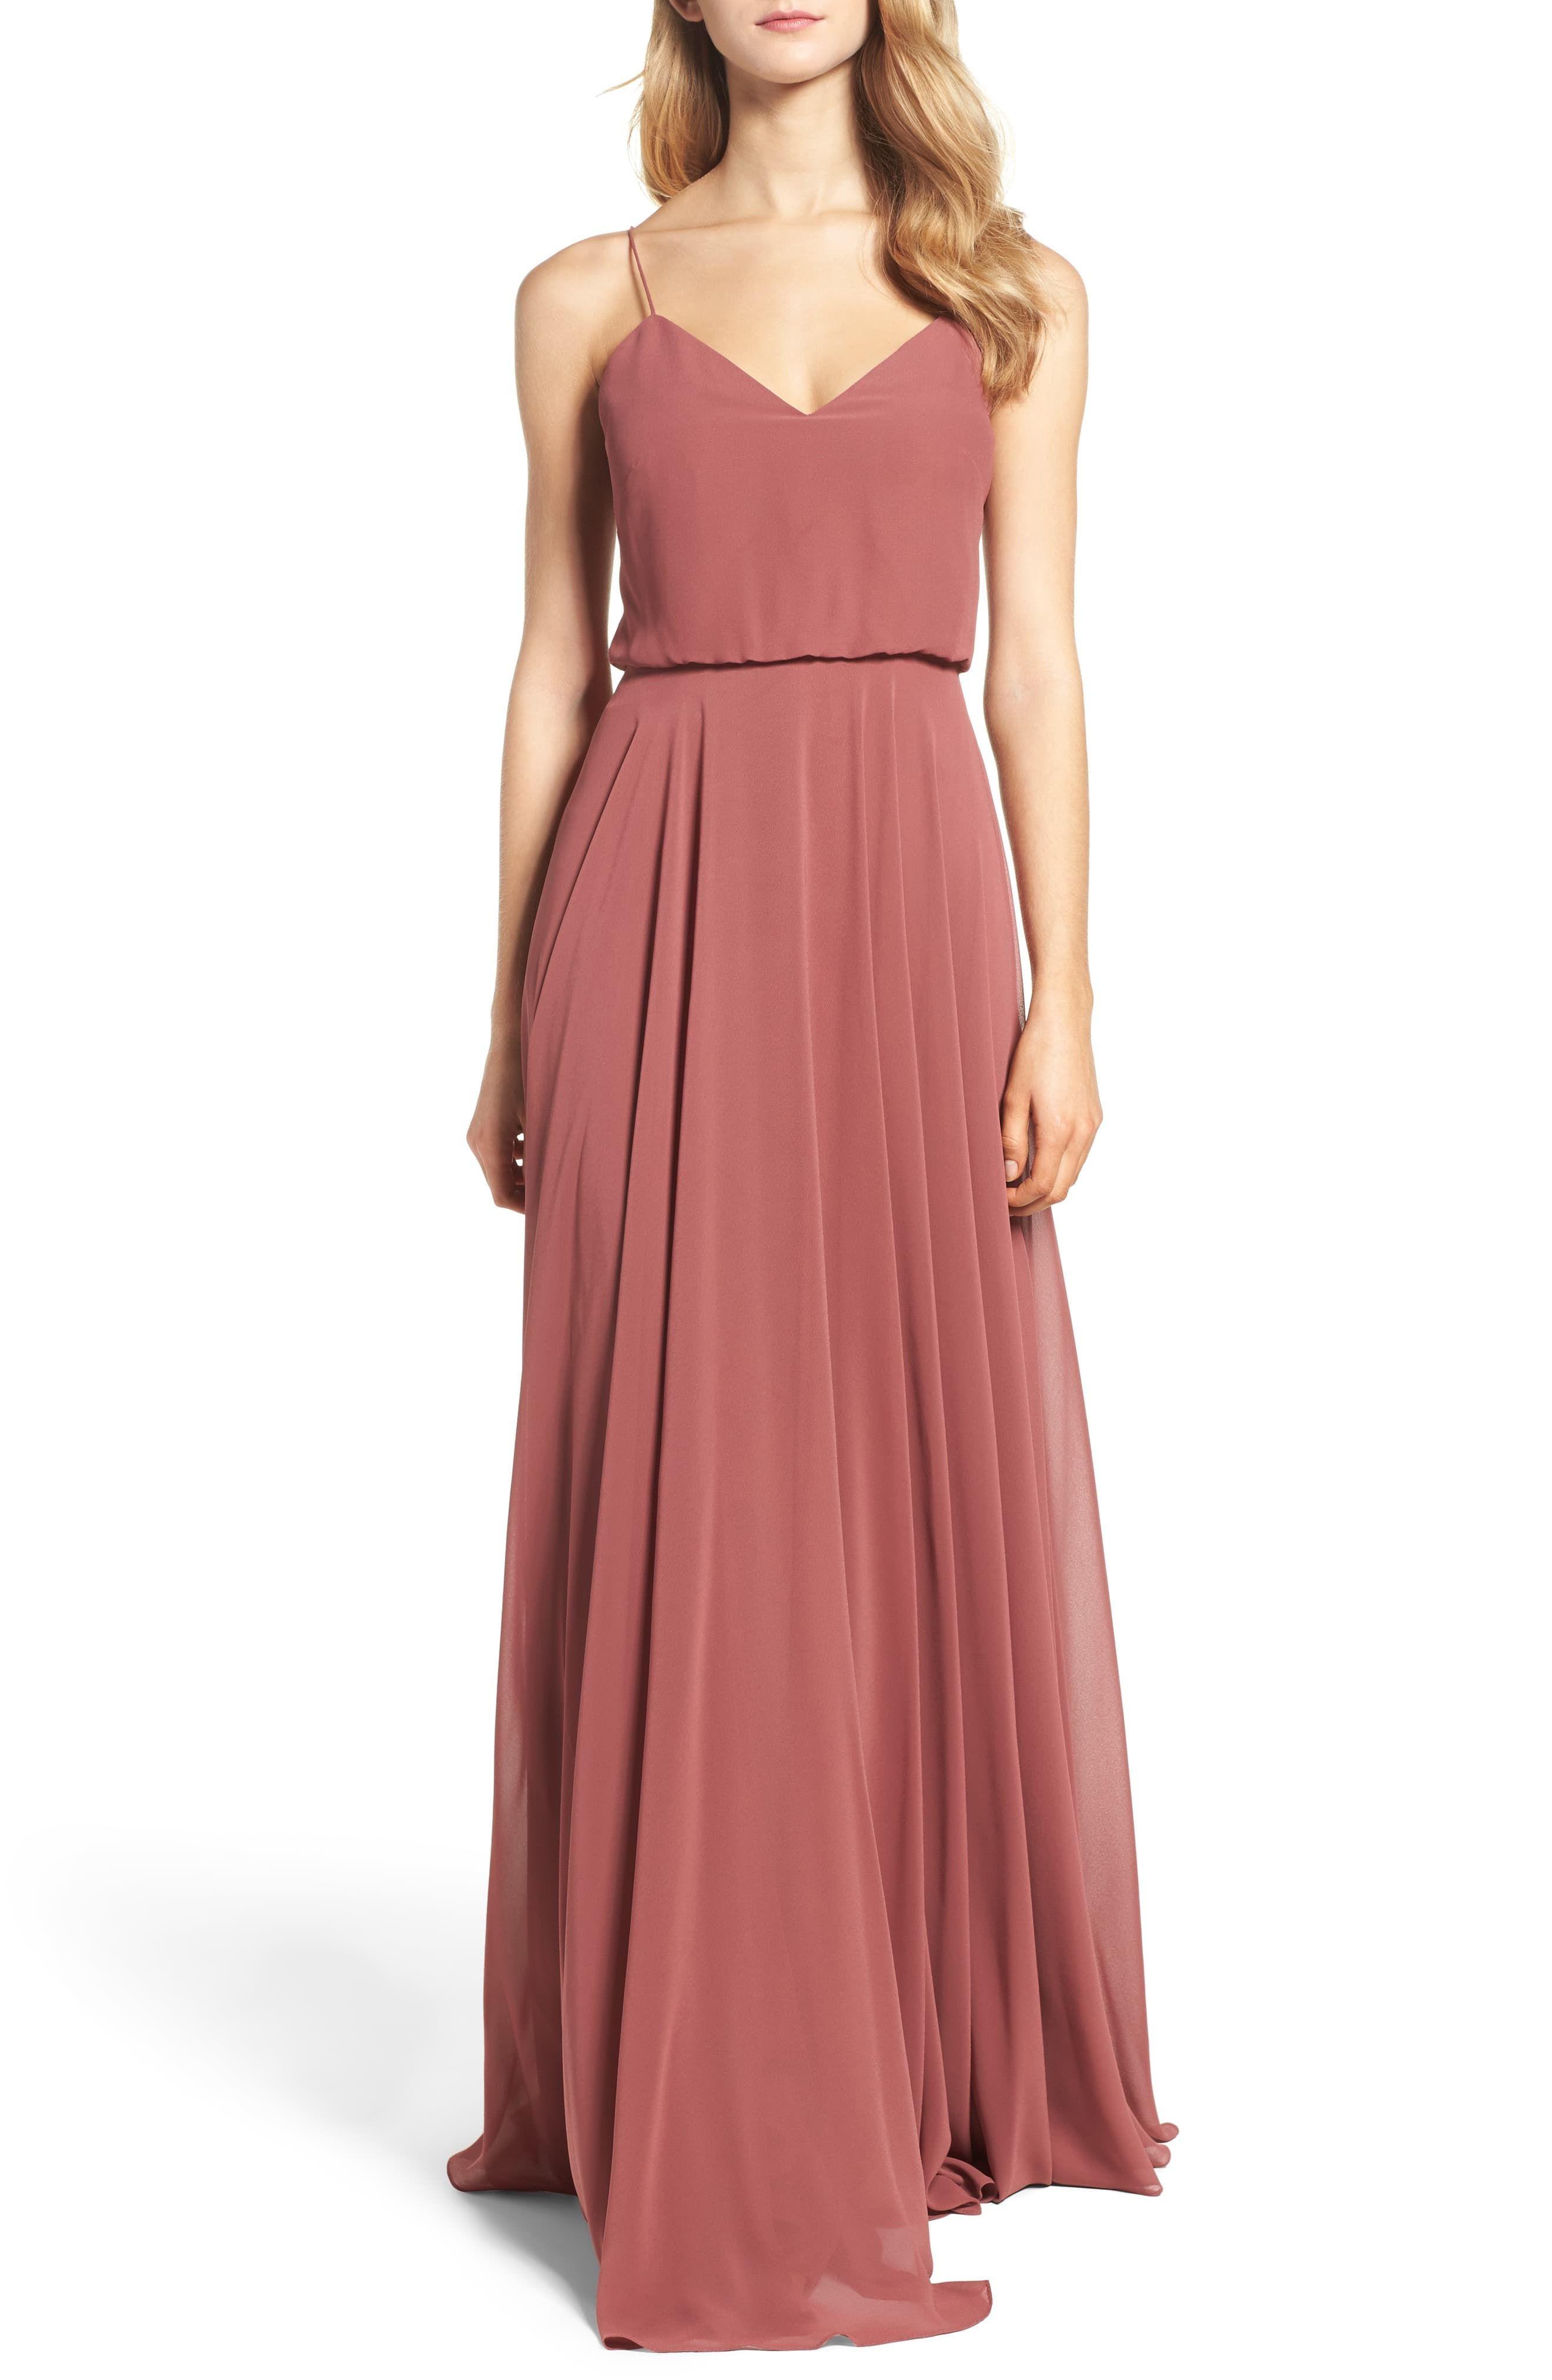 7bd78280a194 Women's Jenny Yoo Inesse Chiffon V-Neck Spaghetti Strap Gown, Size 2 - Pink